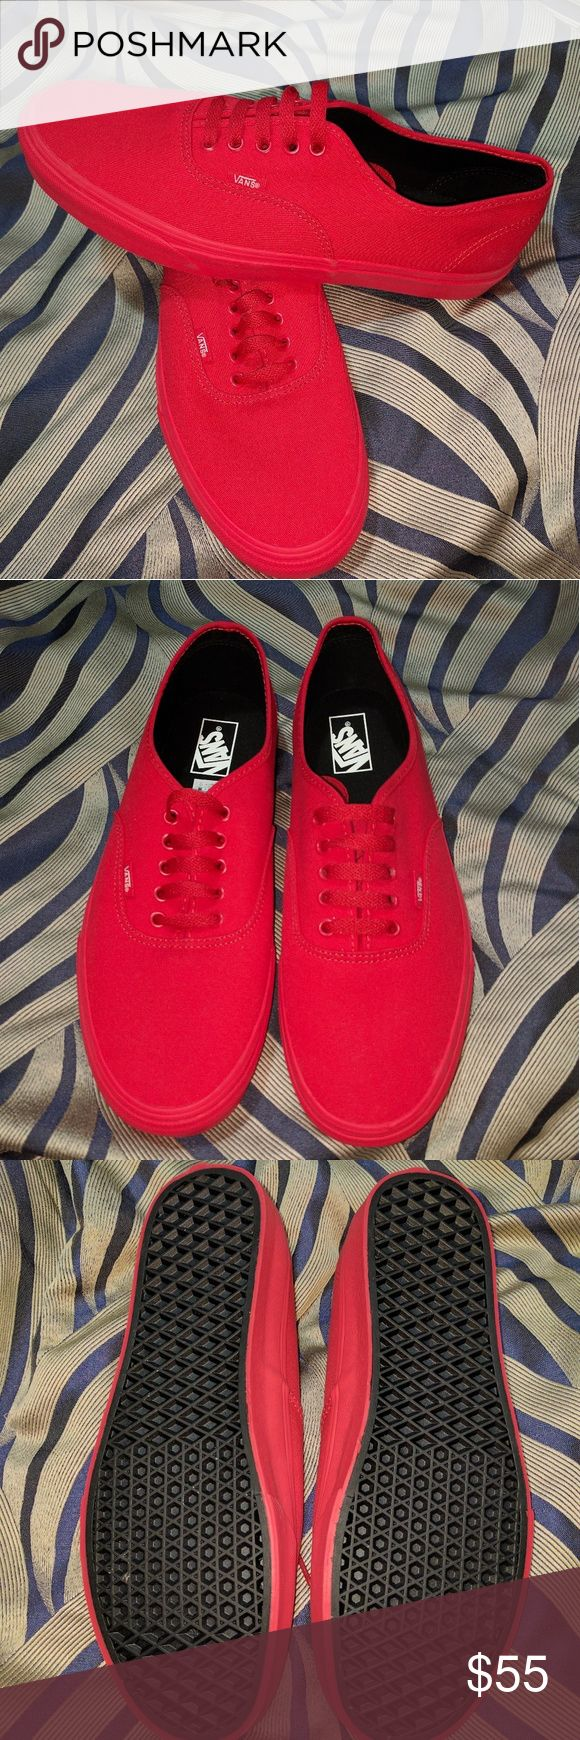 Red Vans Men's size 12 Mono red vans, NWOT. No box included Vans Shoes